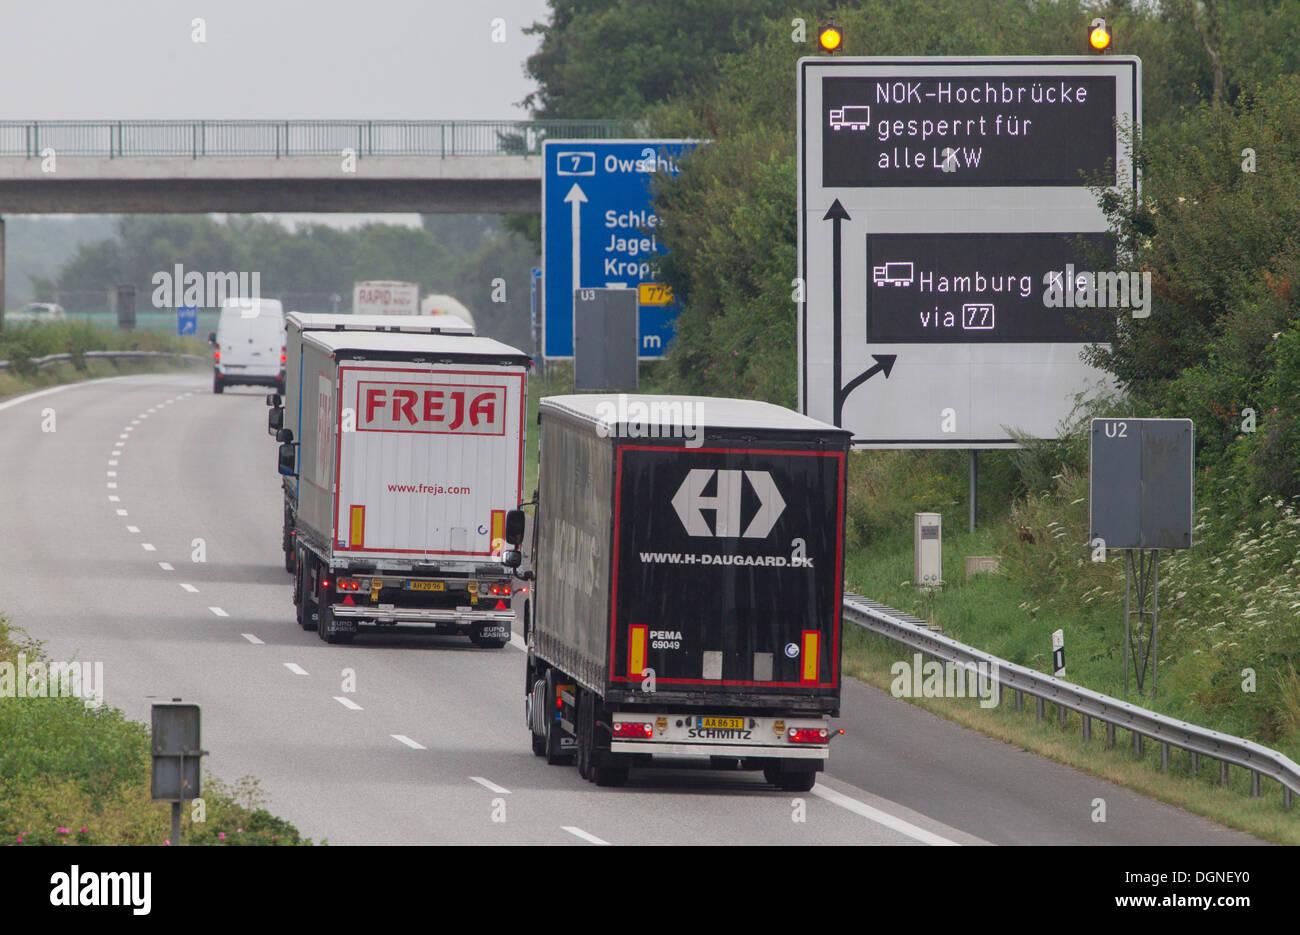 Jagel, Germany, blocking the wheels for trucks Hochbruecke - Stock Image